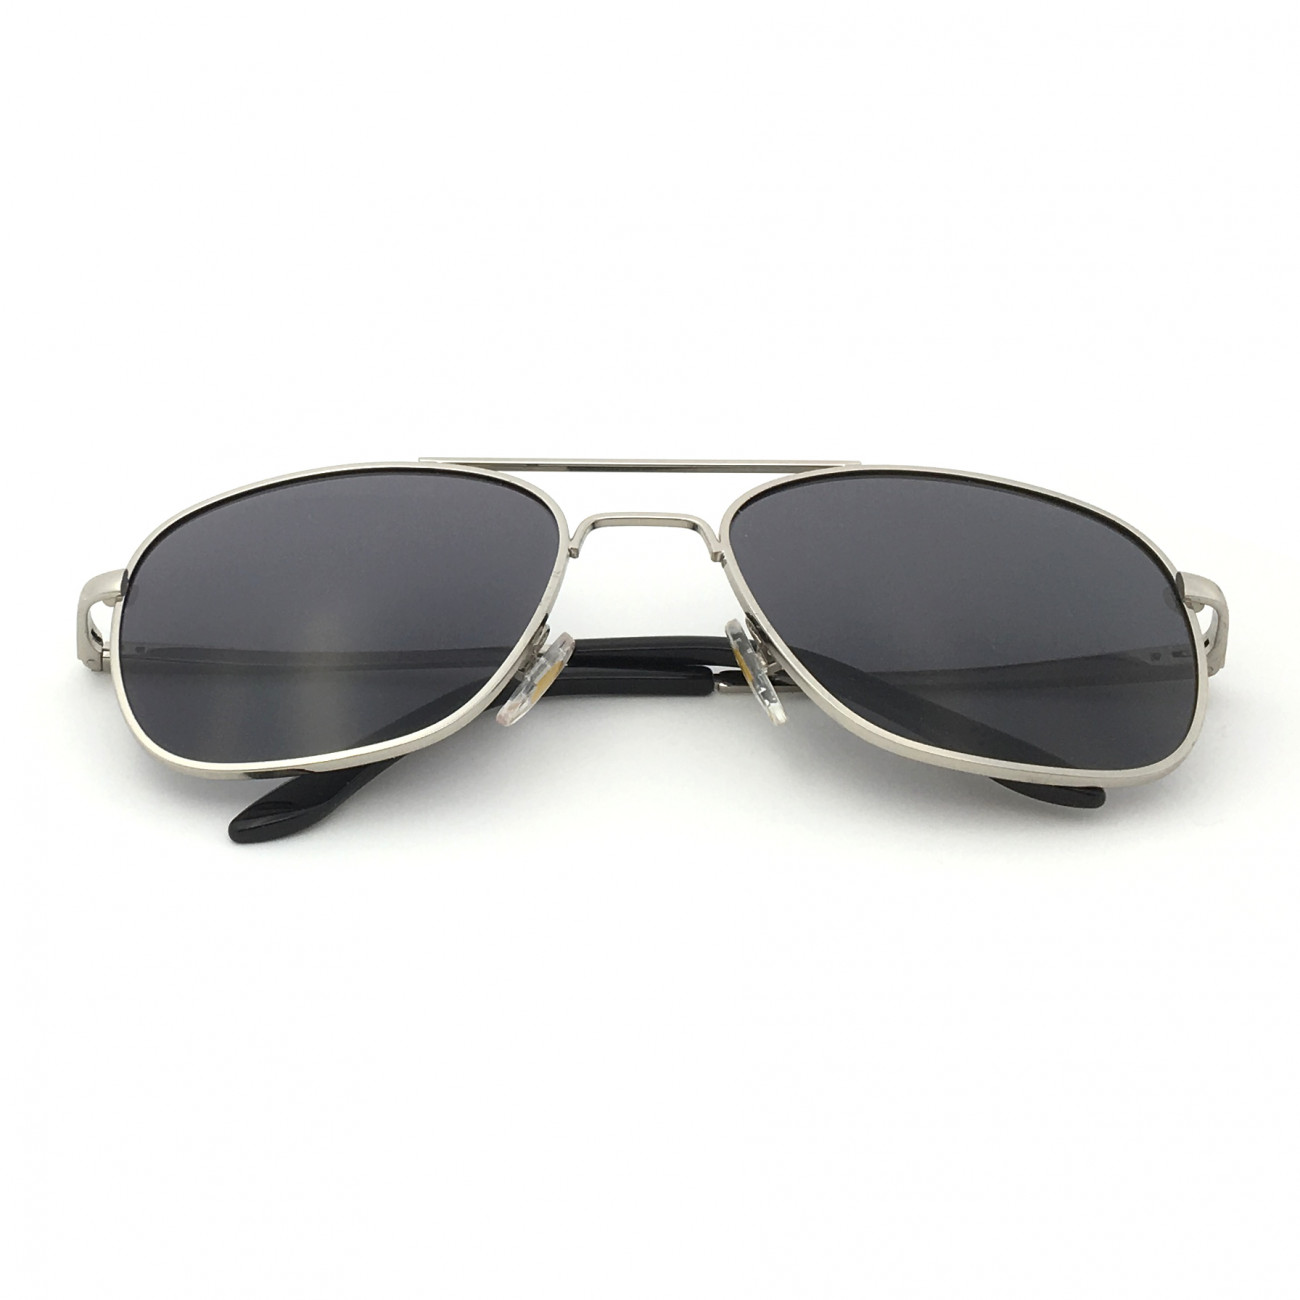 9f9f2c97749 J+S Premium Military Style Classic Square Aviator Sunglasses ...